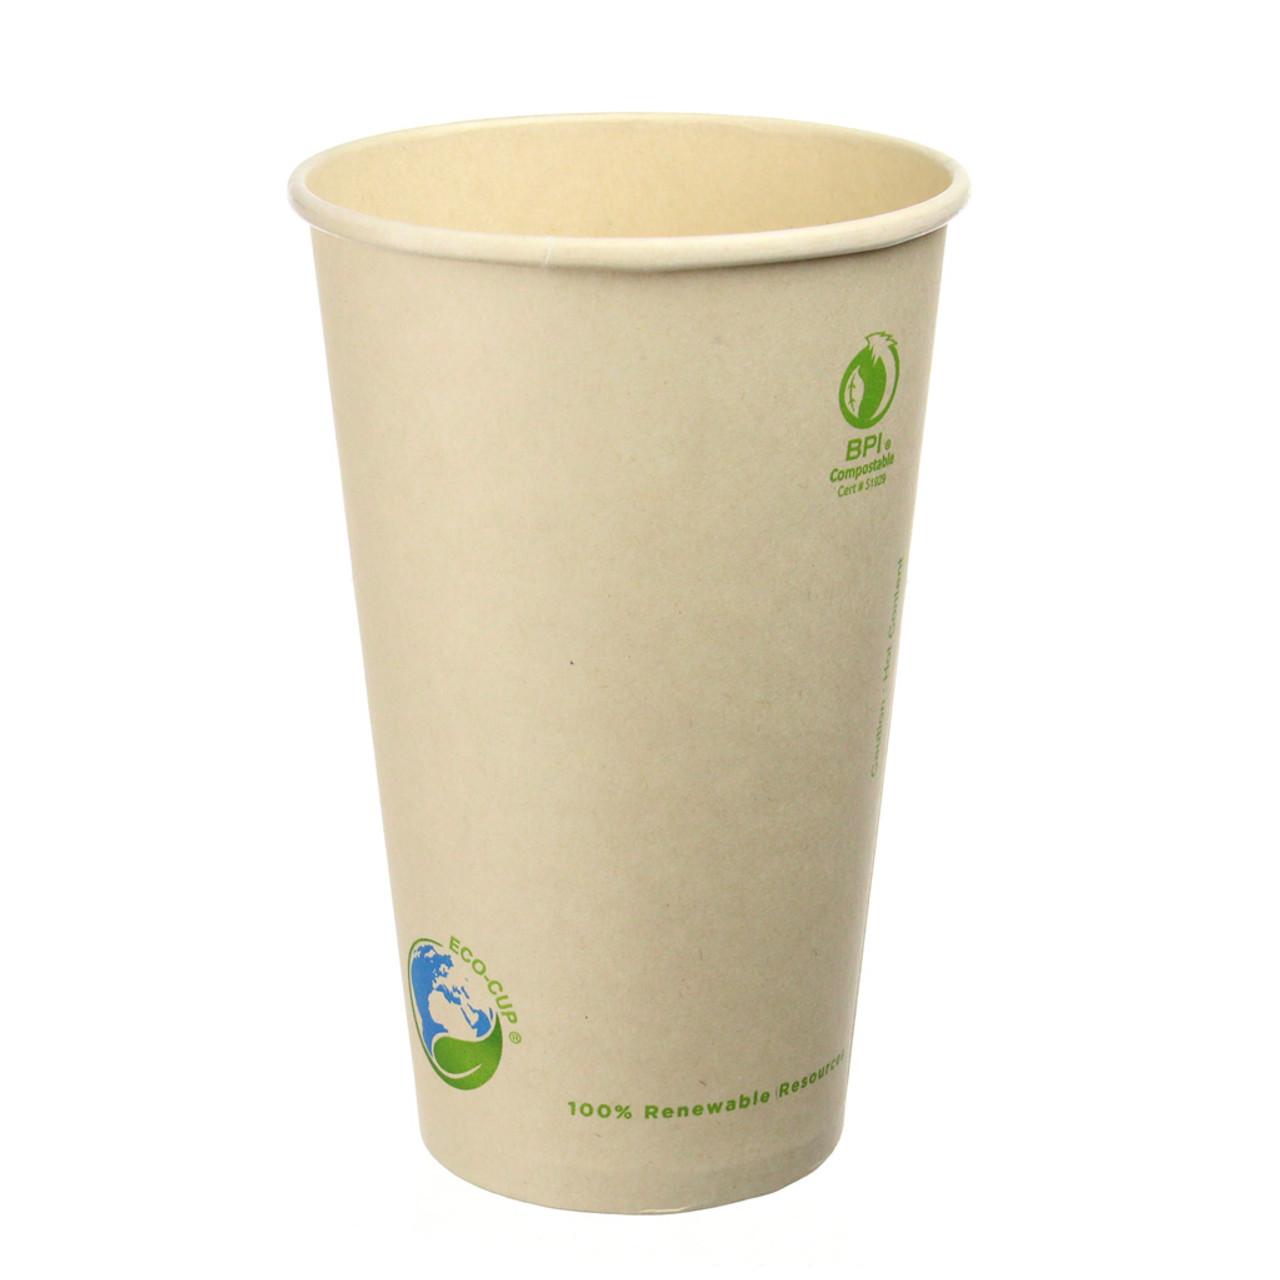 16oz Bamboo Fiber Compostable Coffee Cups